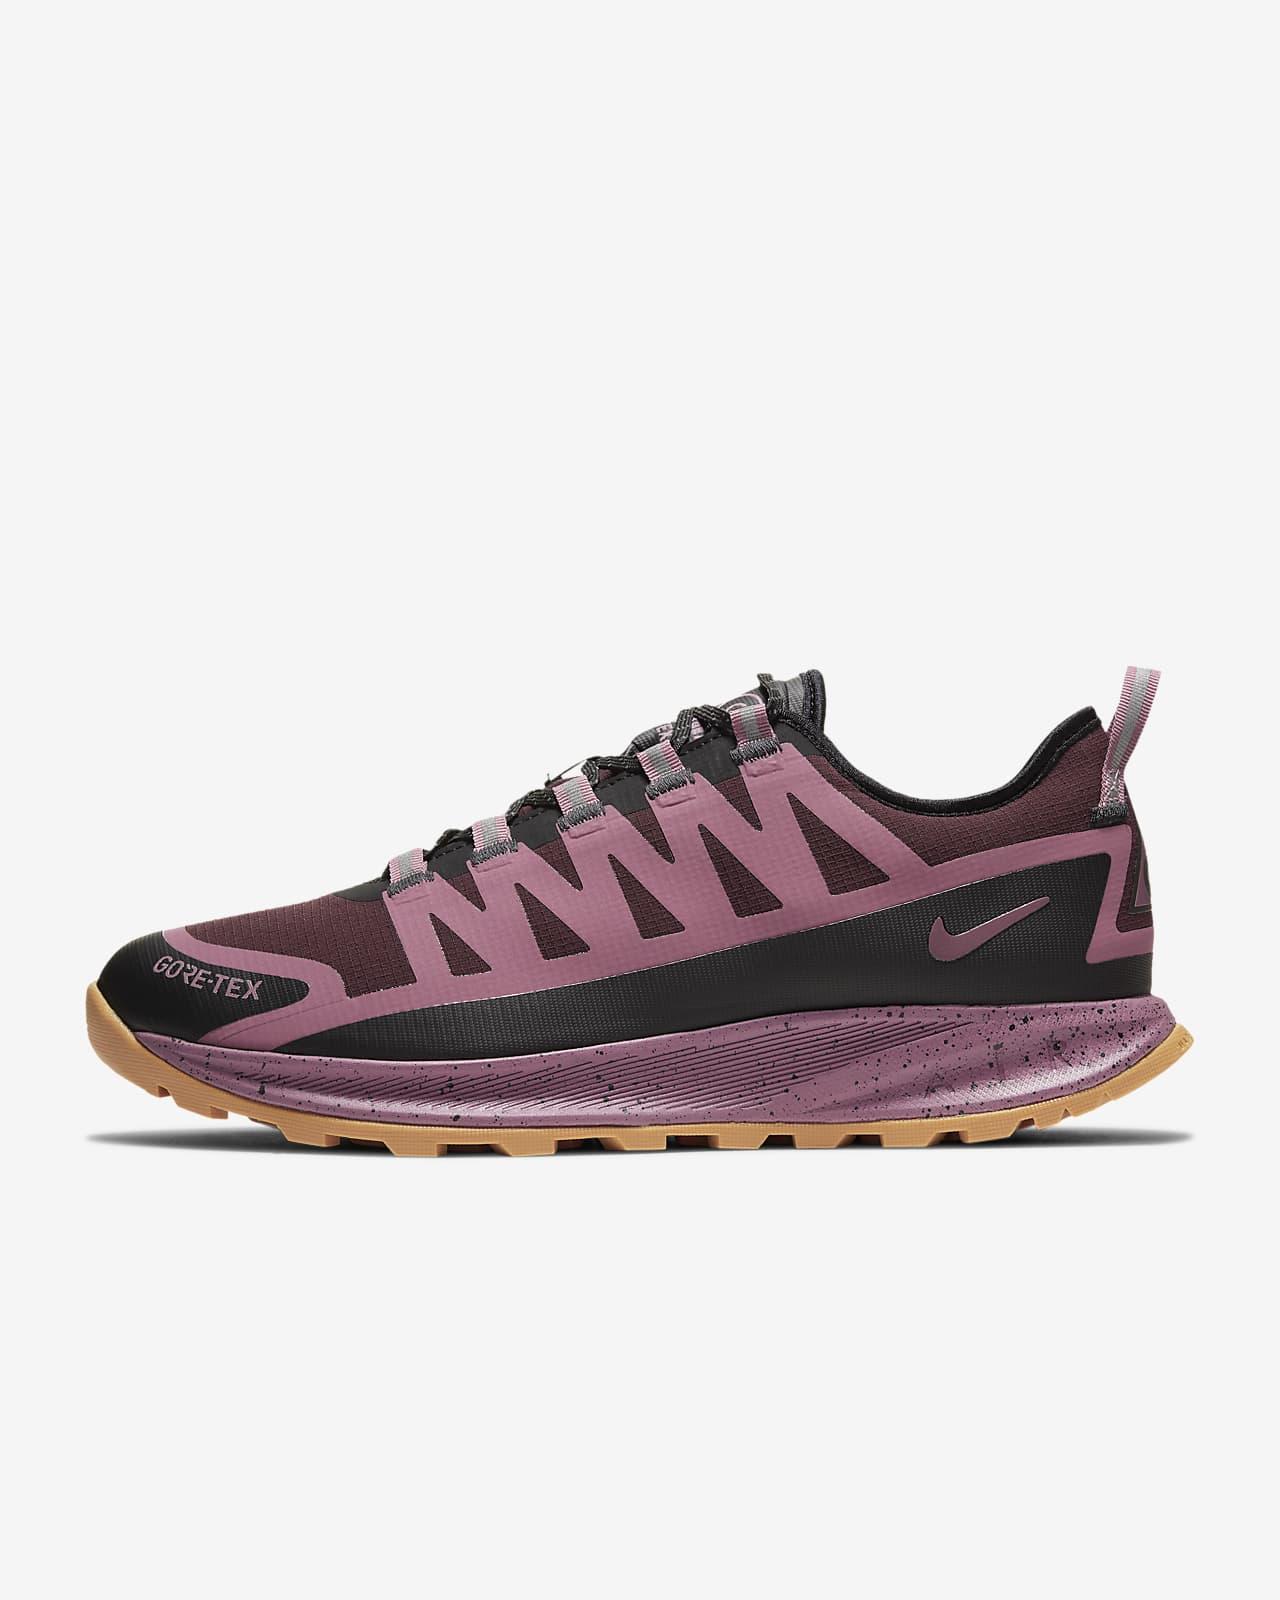 Nike ACG Air Nasu GORE-TEX Shoe. Nike LU